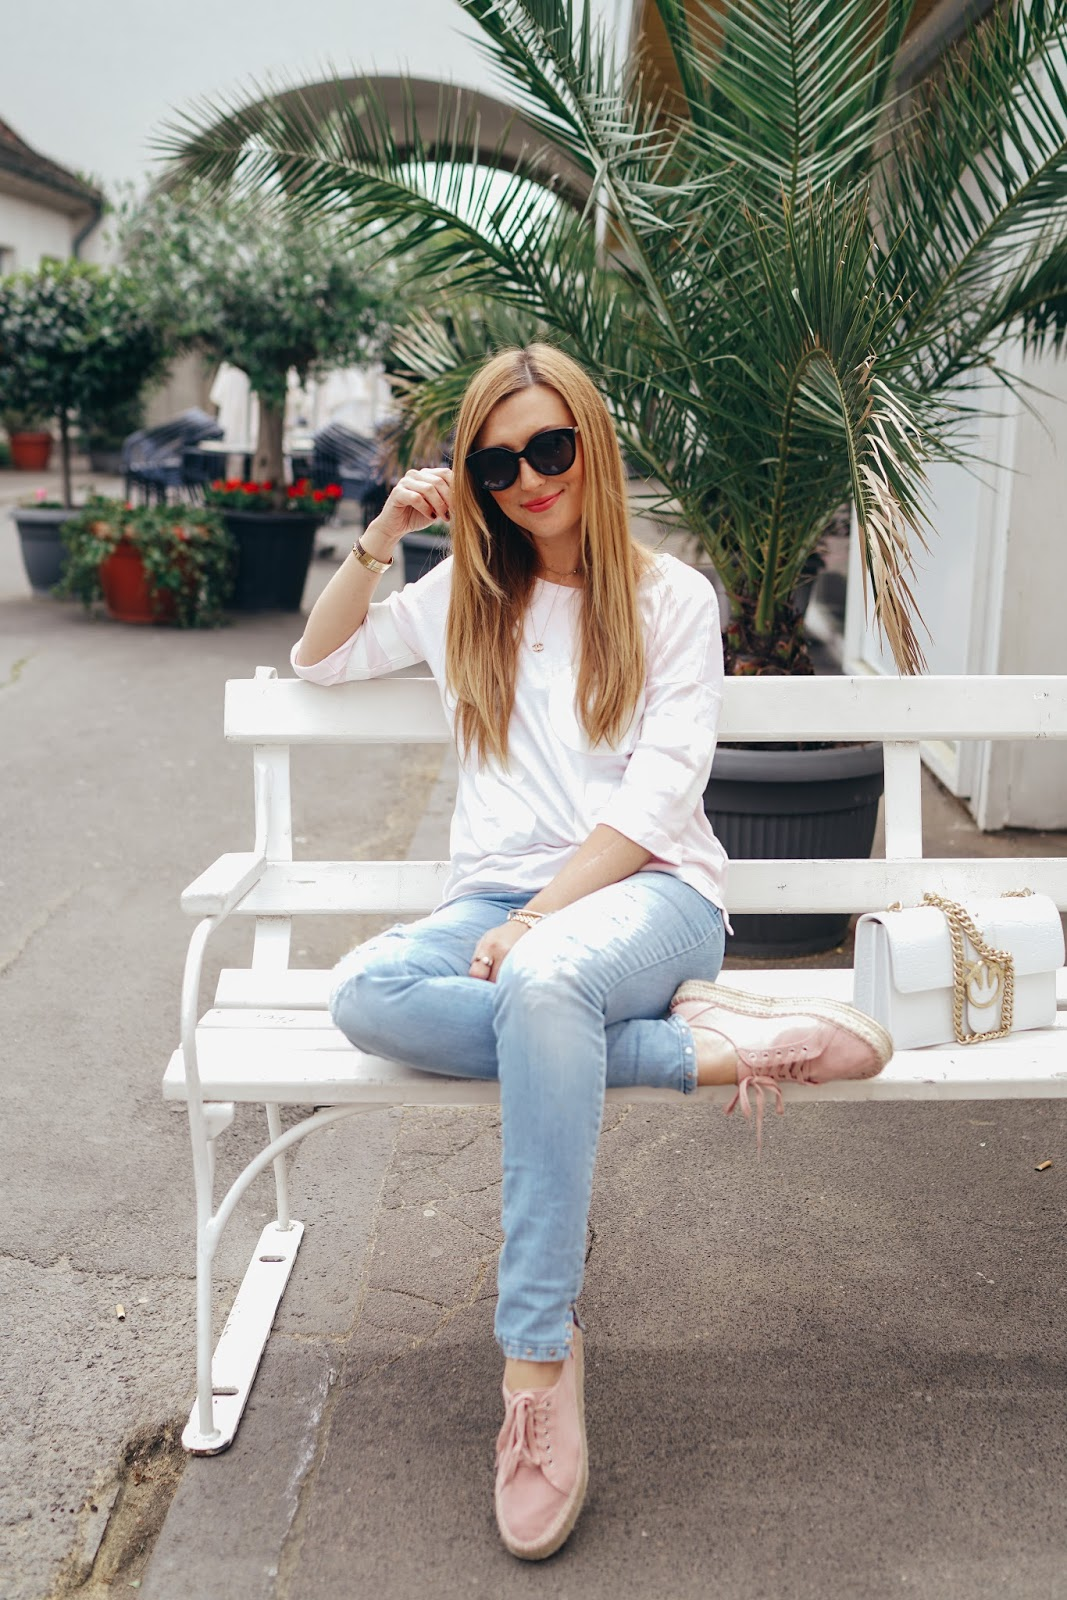 Collage-Look-Plateau-Schuhe-Plateu-Sneaker-kombinieren-bloggerstyle